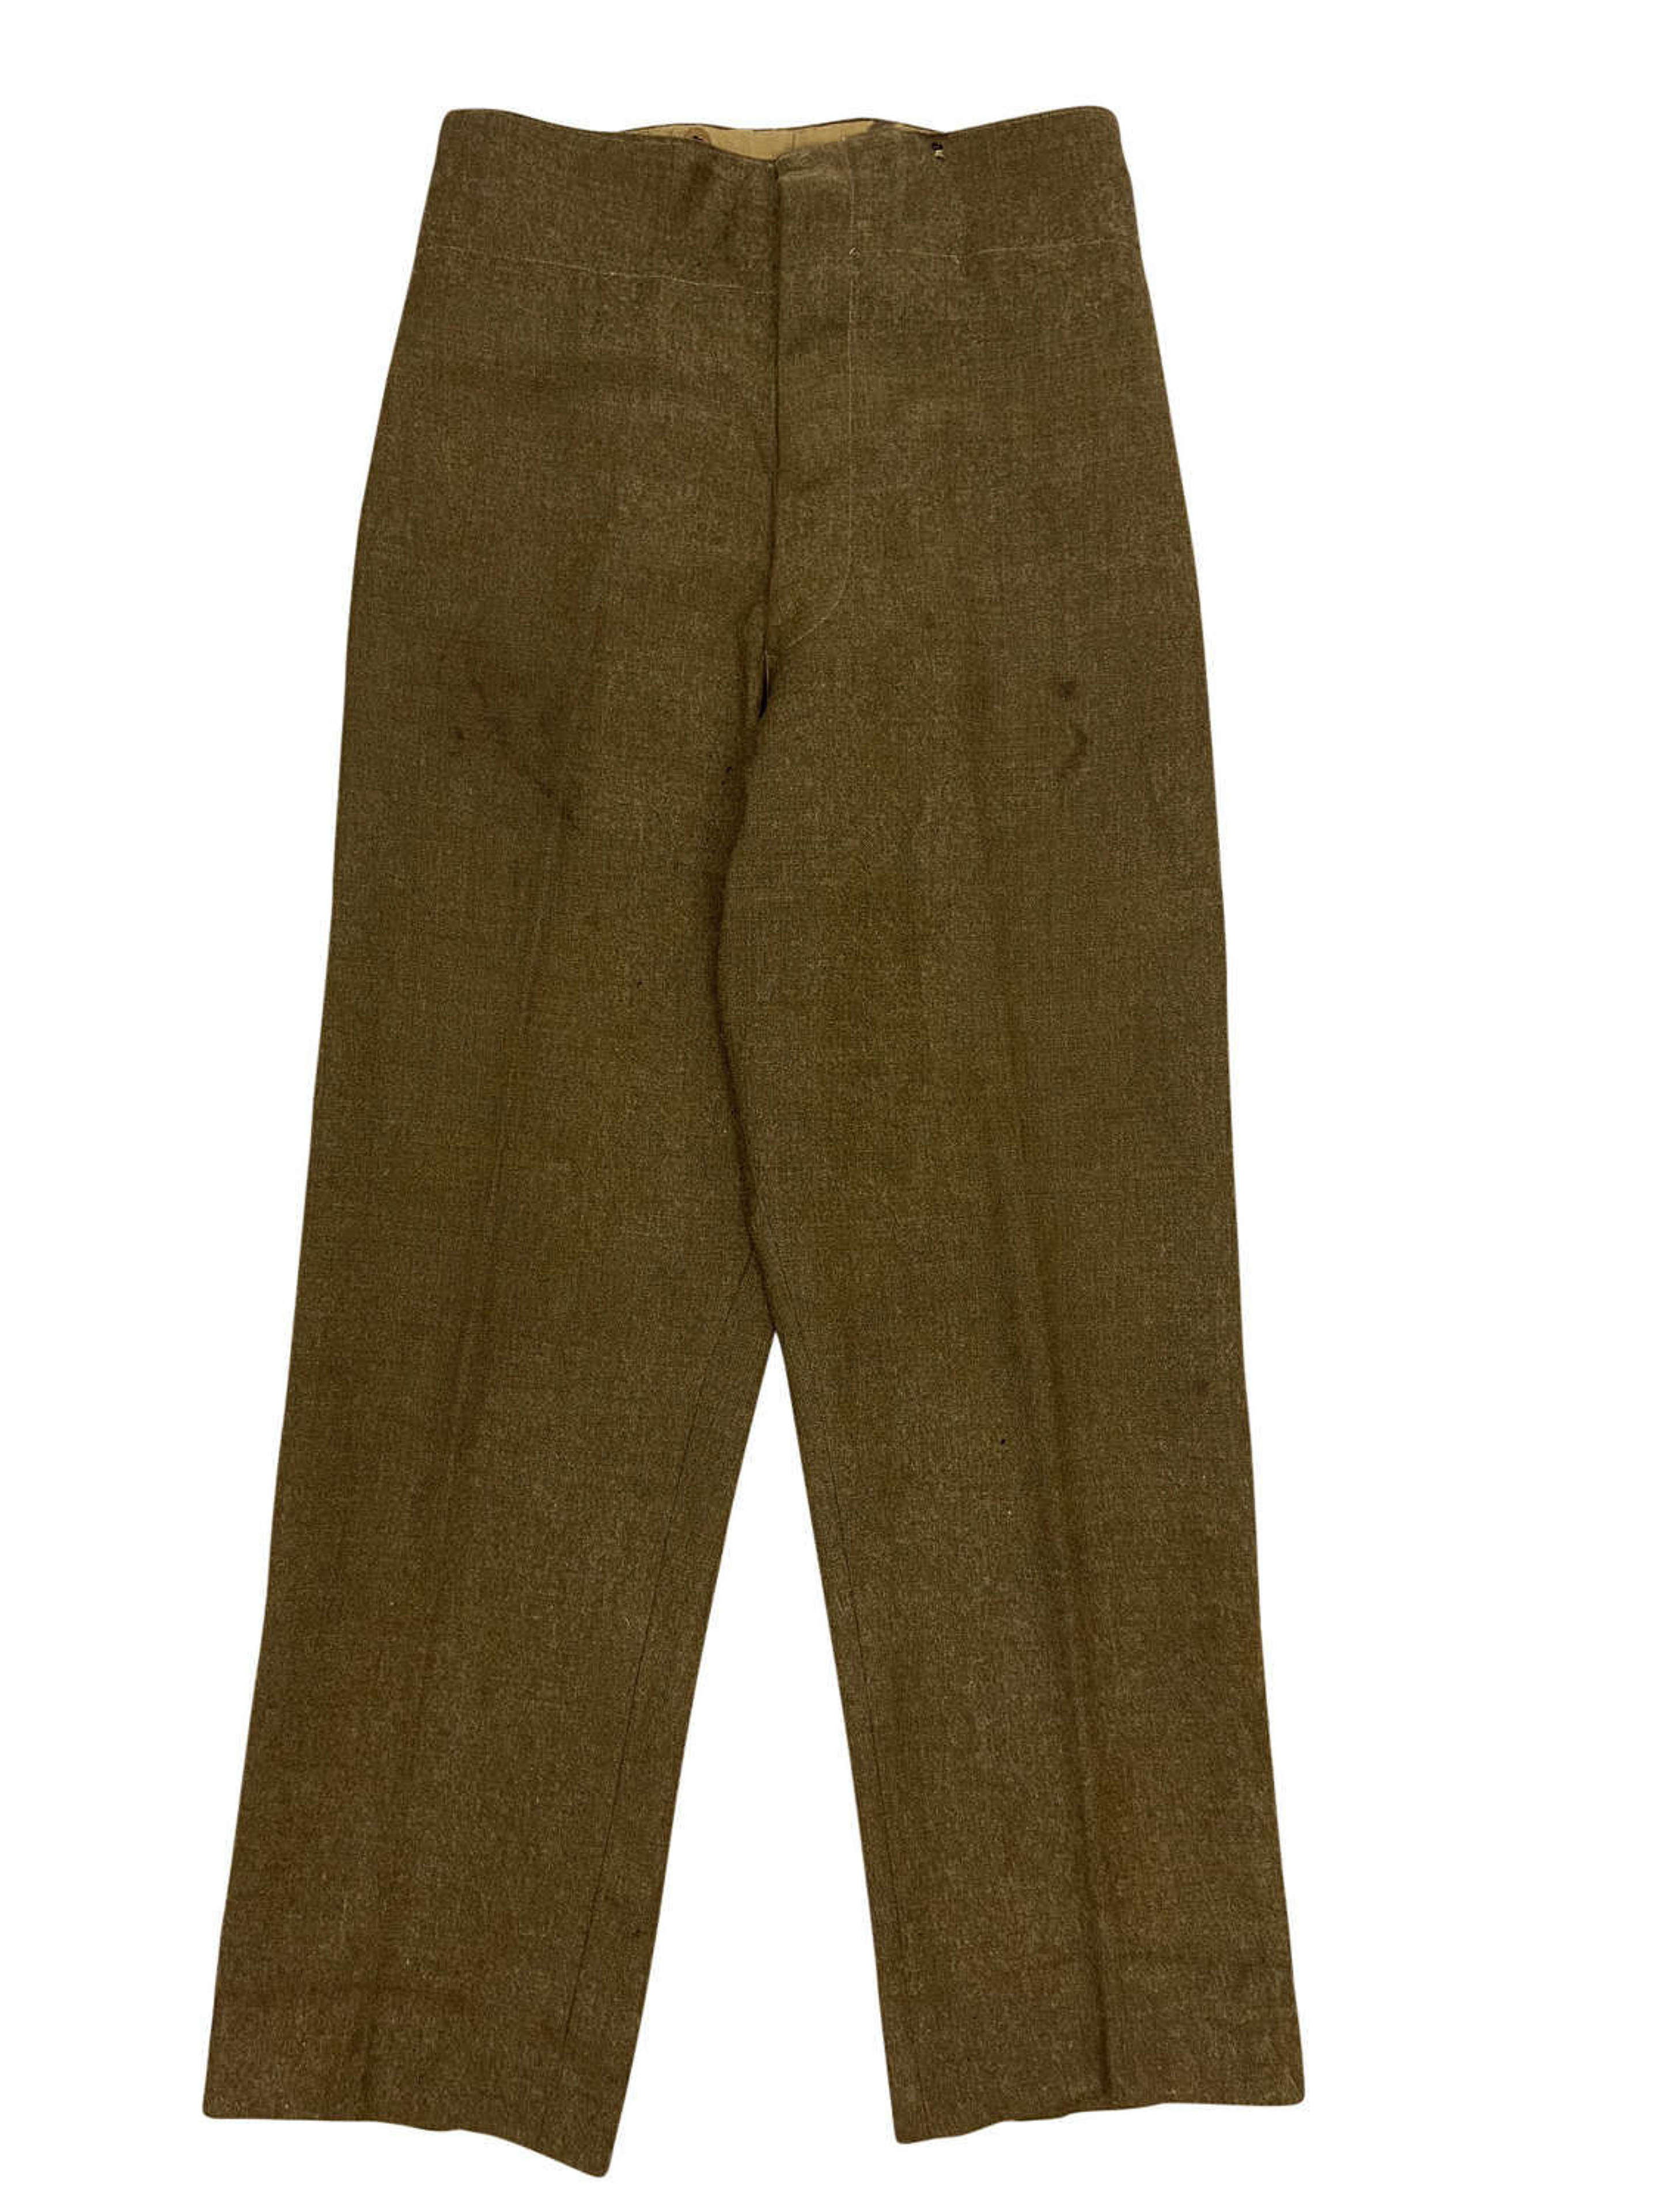 Original 1943 Dated 1940 Pattern (Austerity) Batteldress Trousers